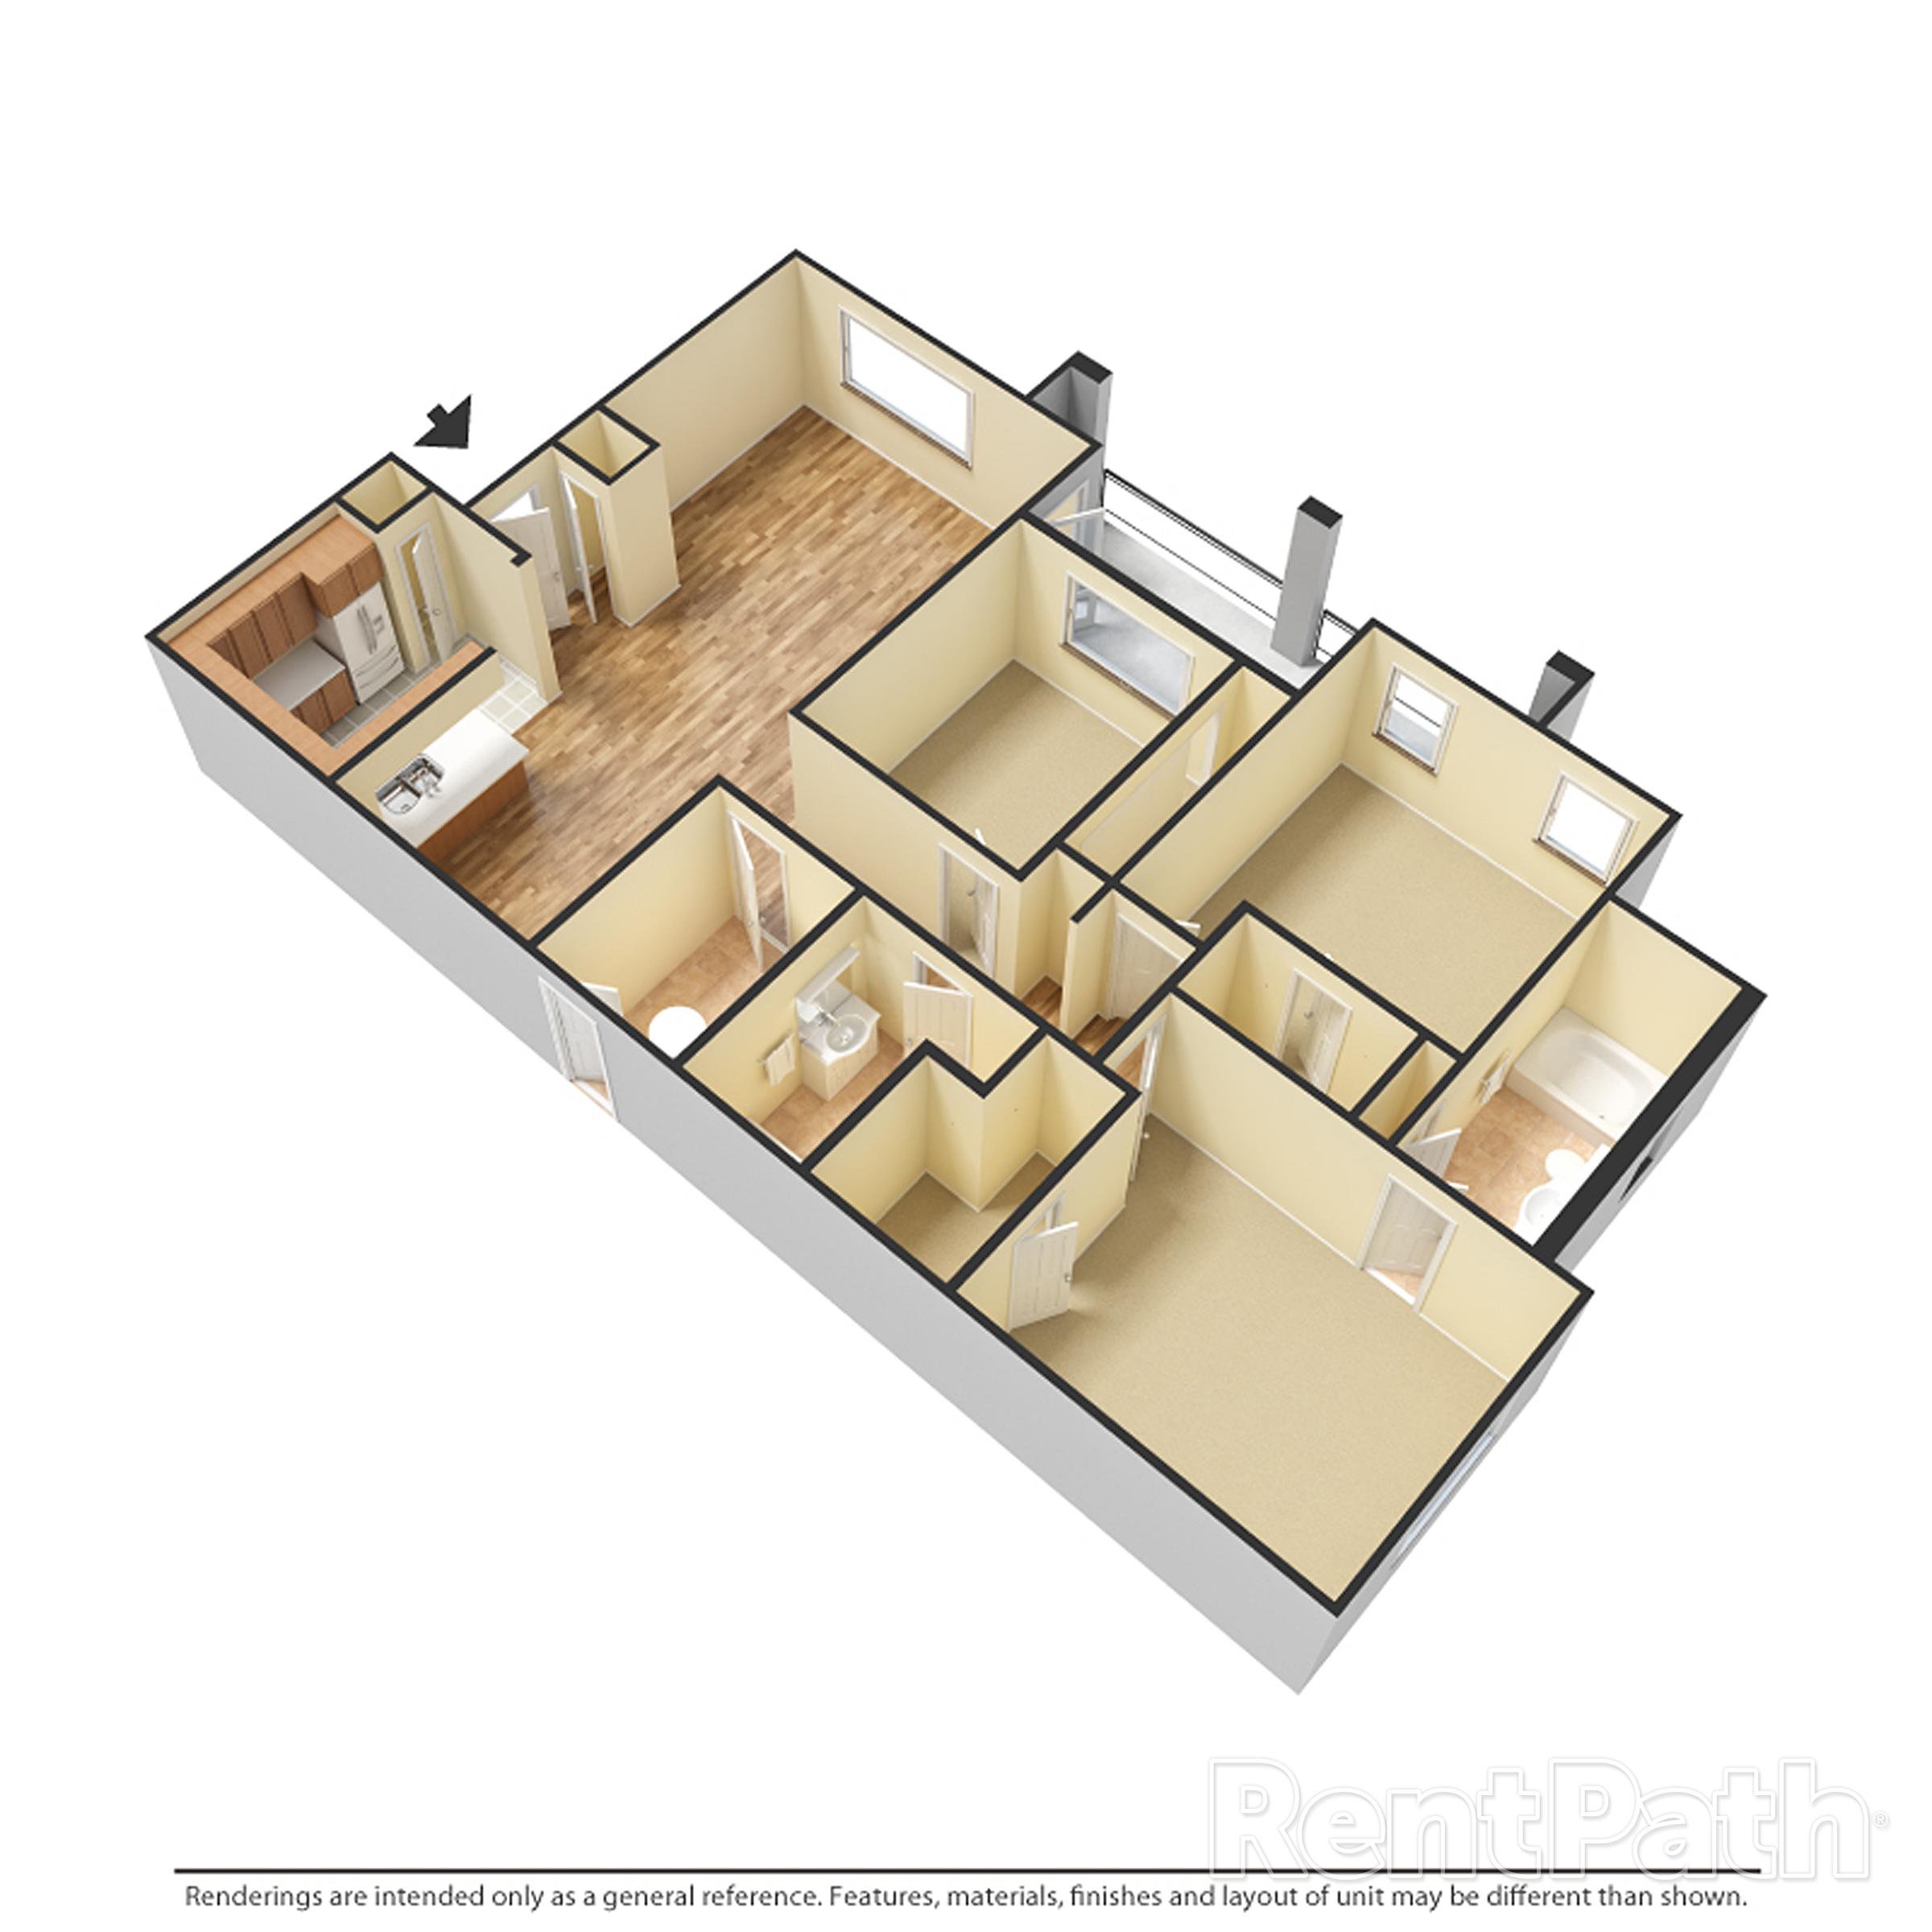 Floorplan C2